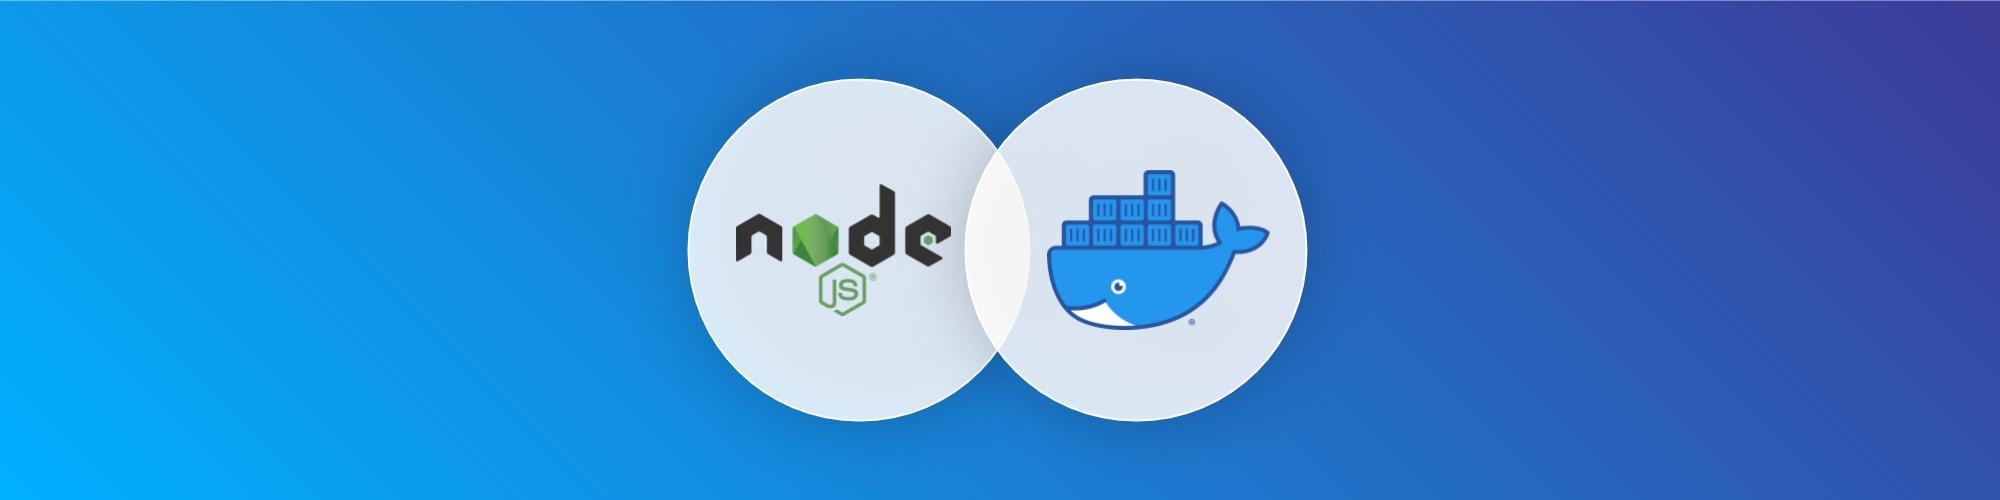 docker node